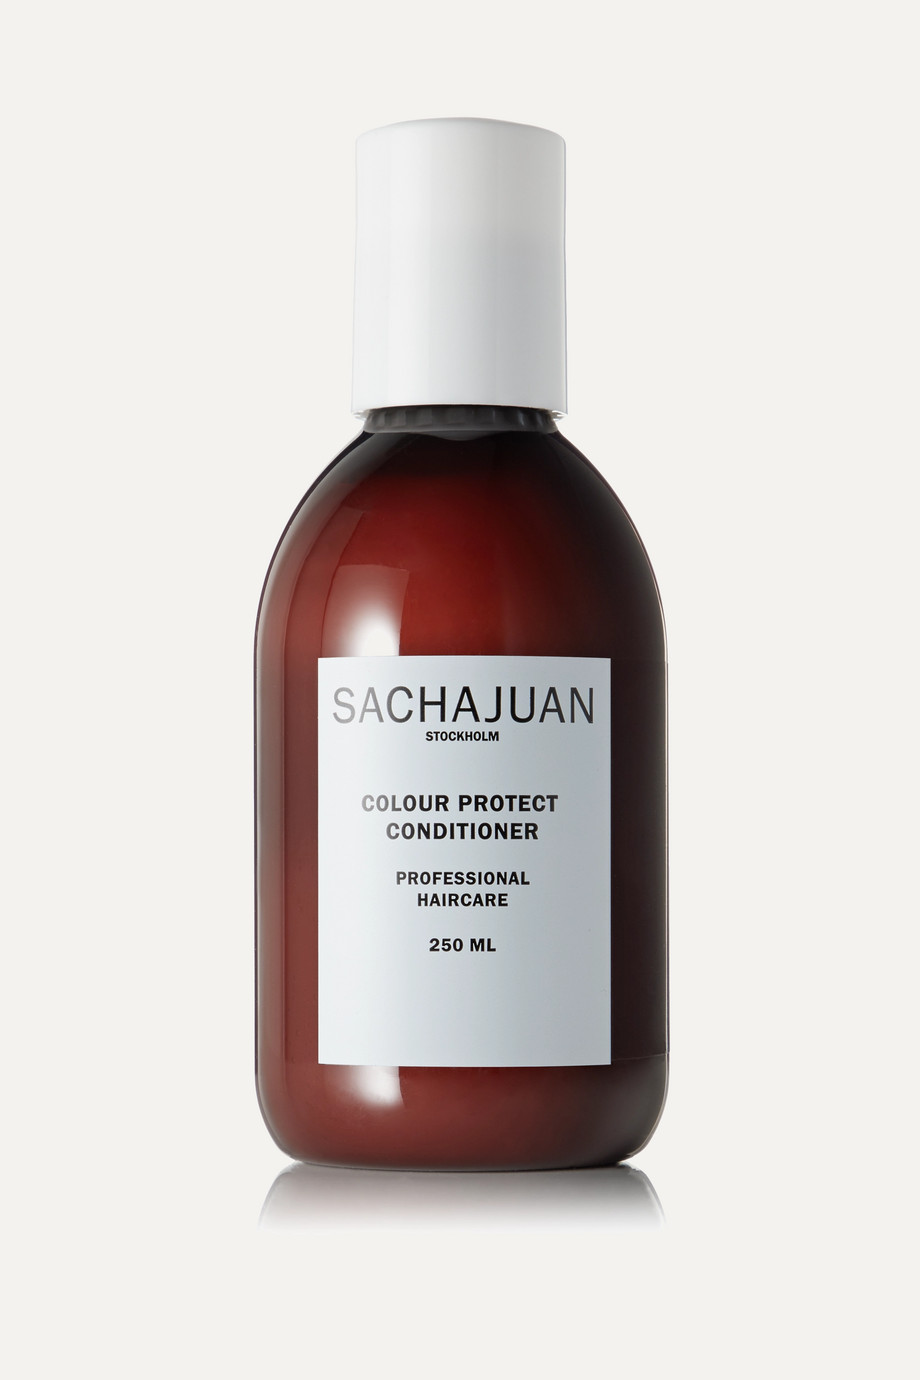 SACHAJUAN Colour Protect Conditioner, 250 ml – Conditioner für coloriertes Haar